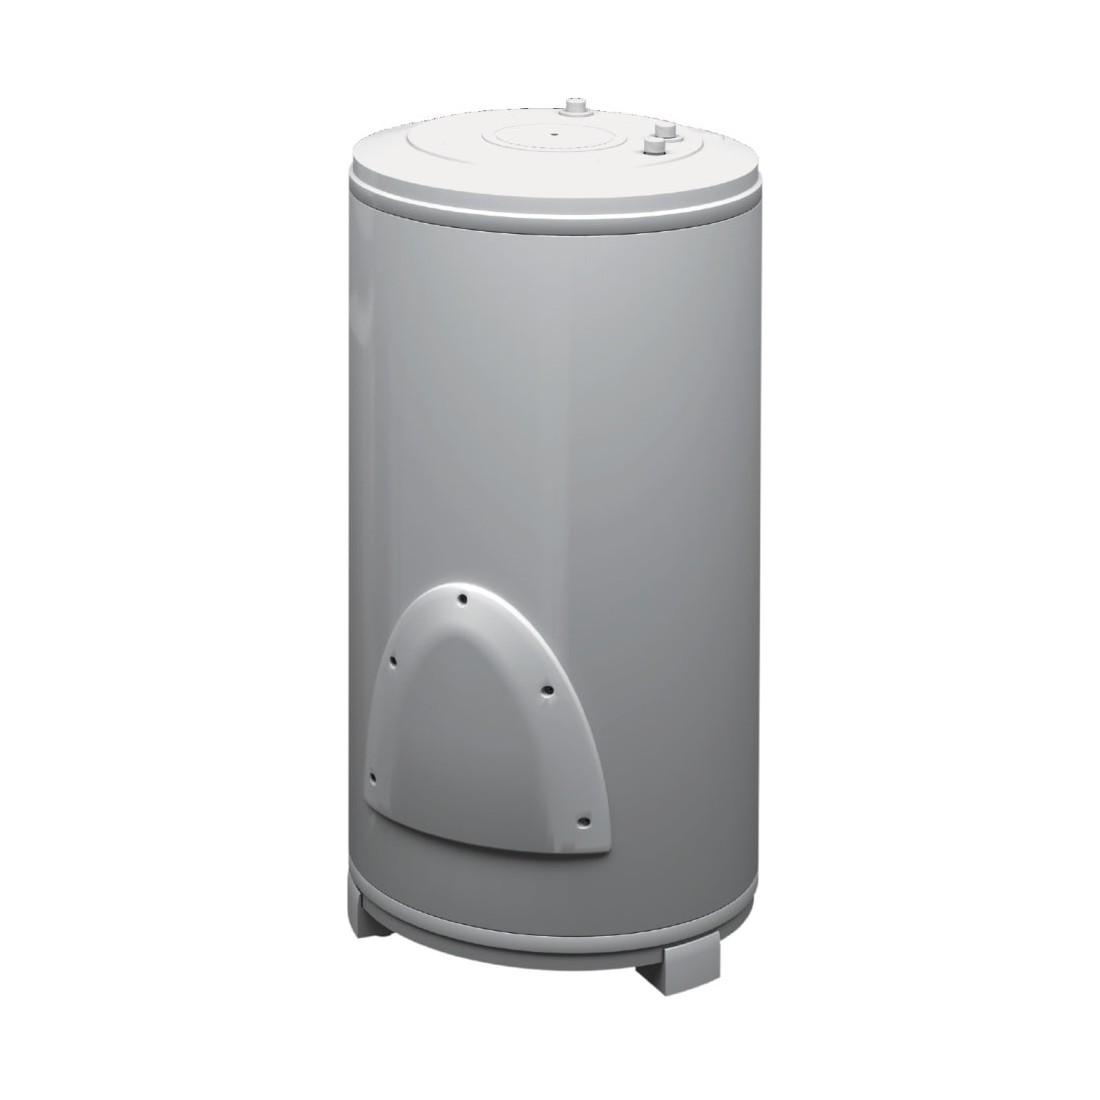 Šilumos siurblys Oras-Vanduo Ariston Nimbus, Flex, 90 S Net 14 kW Φ3, su 300 (286 l) vandens šildytuvu ir Wi-Fi